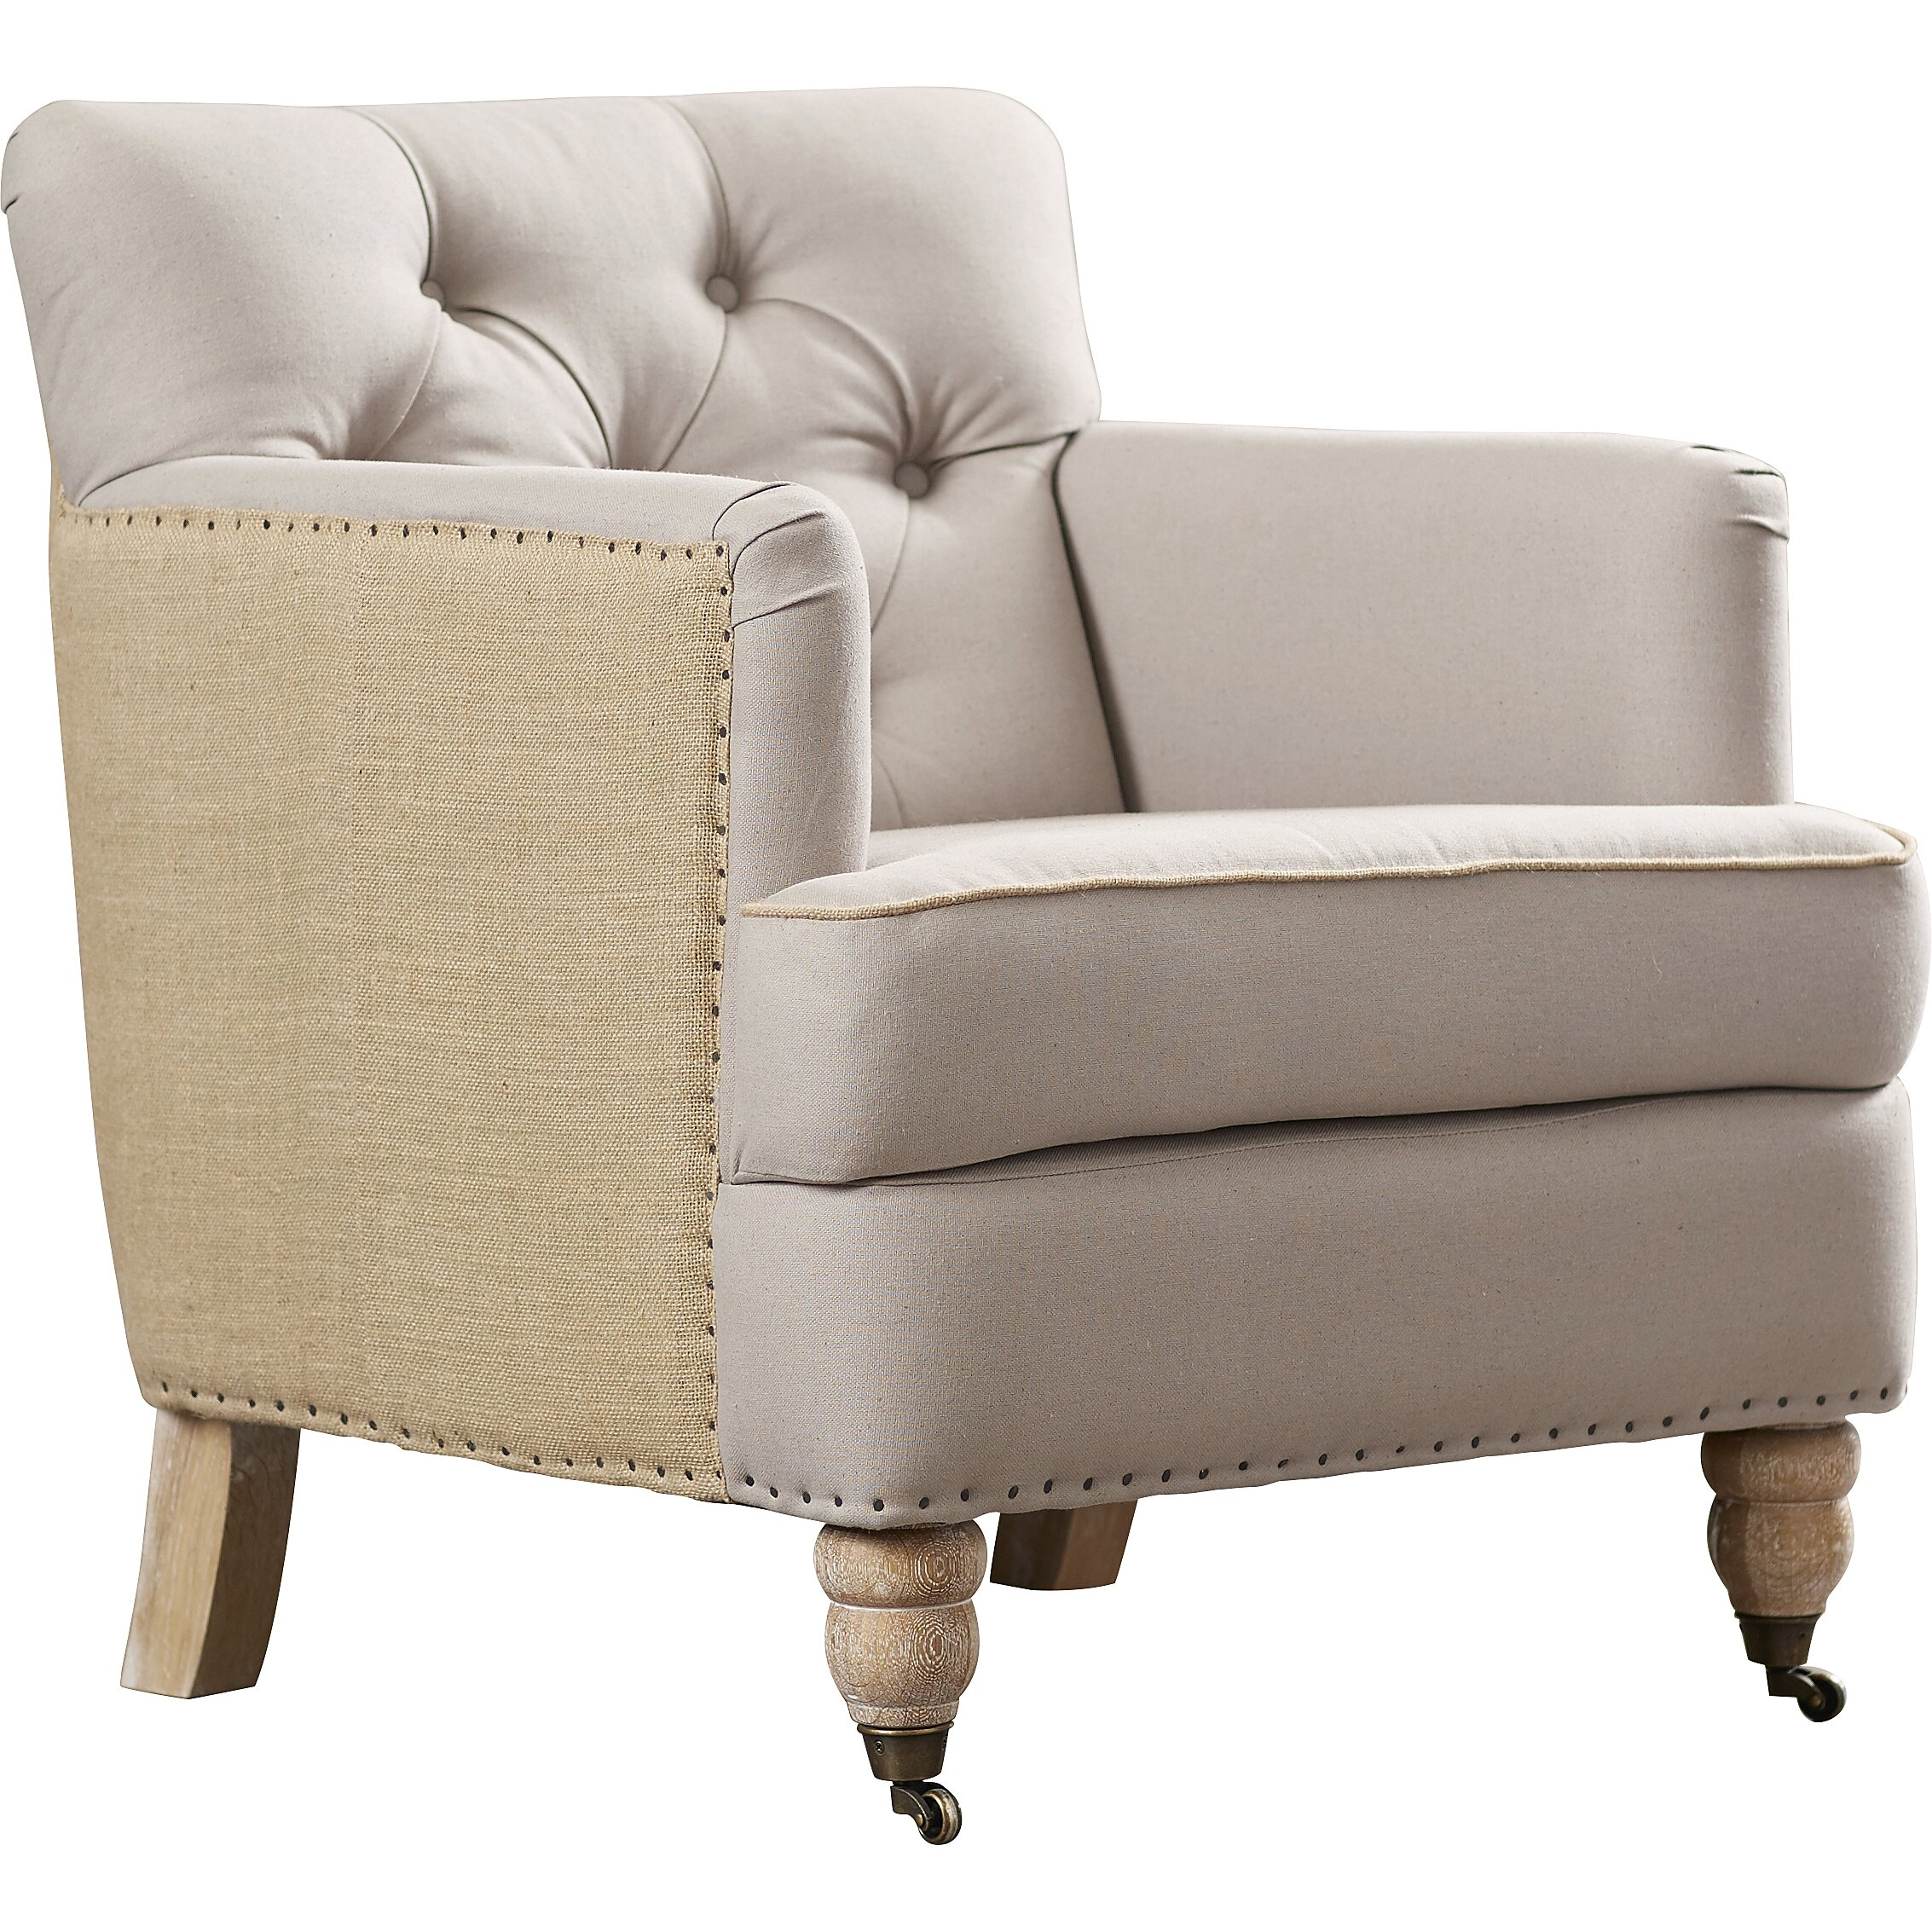 Lark manor minerve tufted arm chair amp reviews wayfair